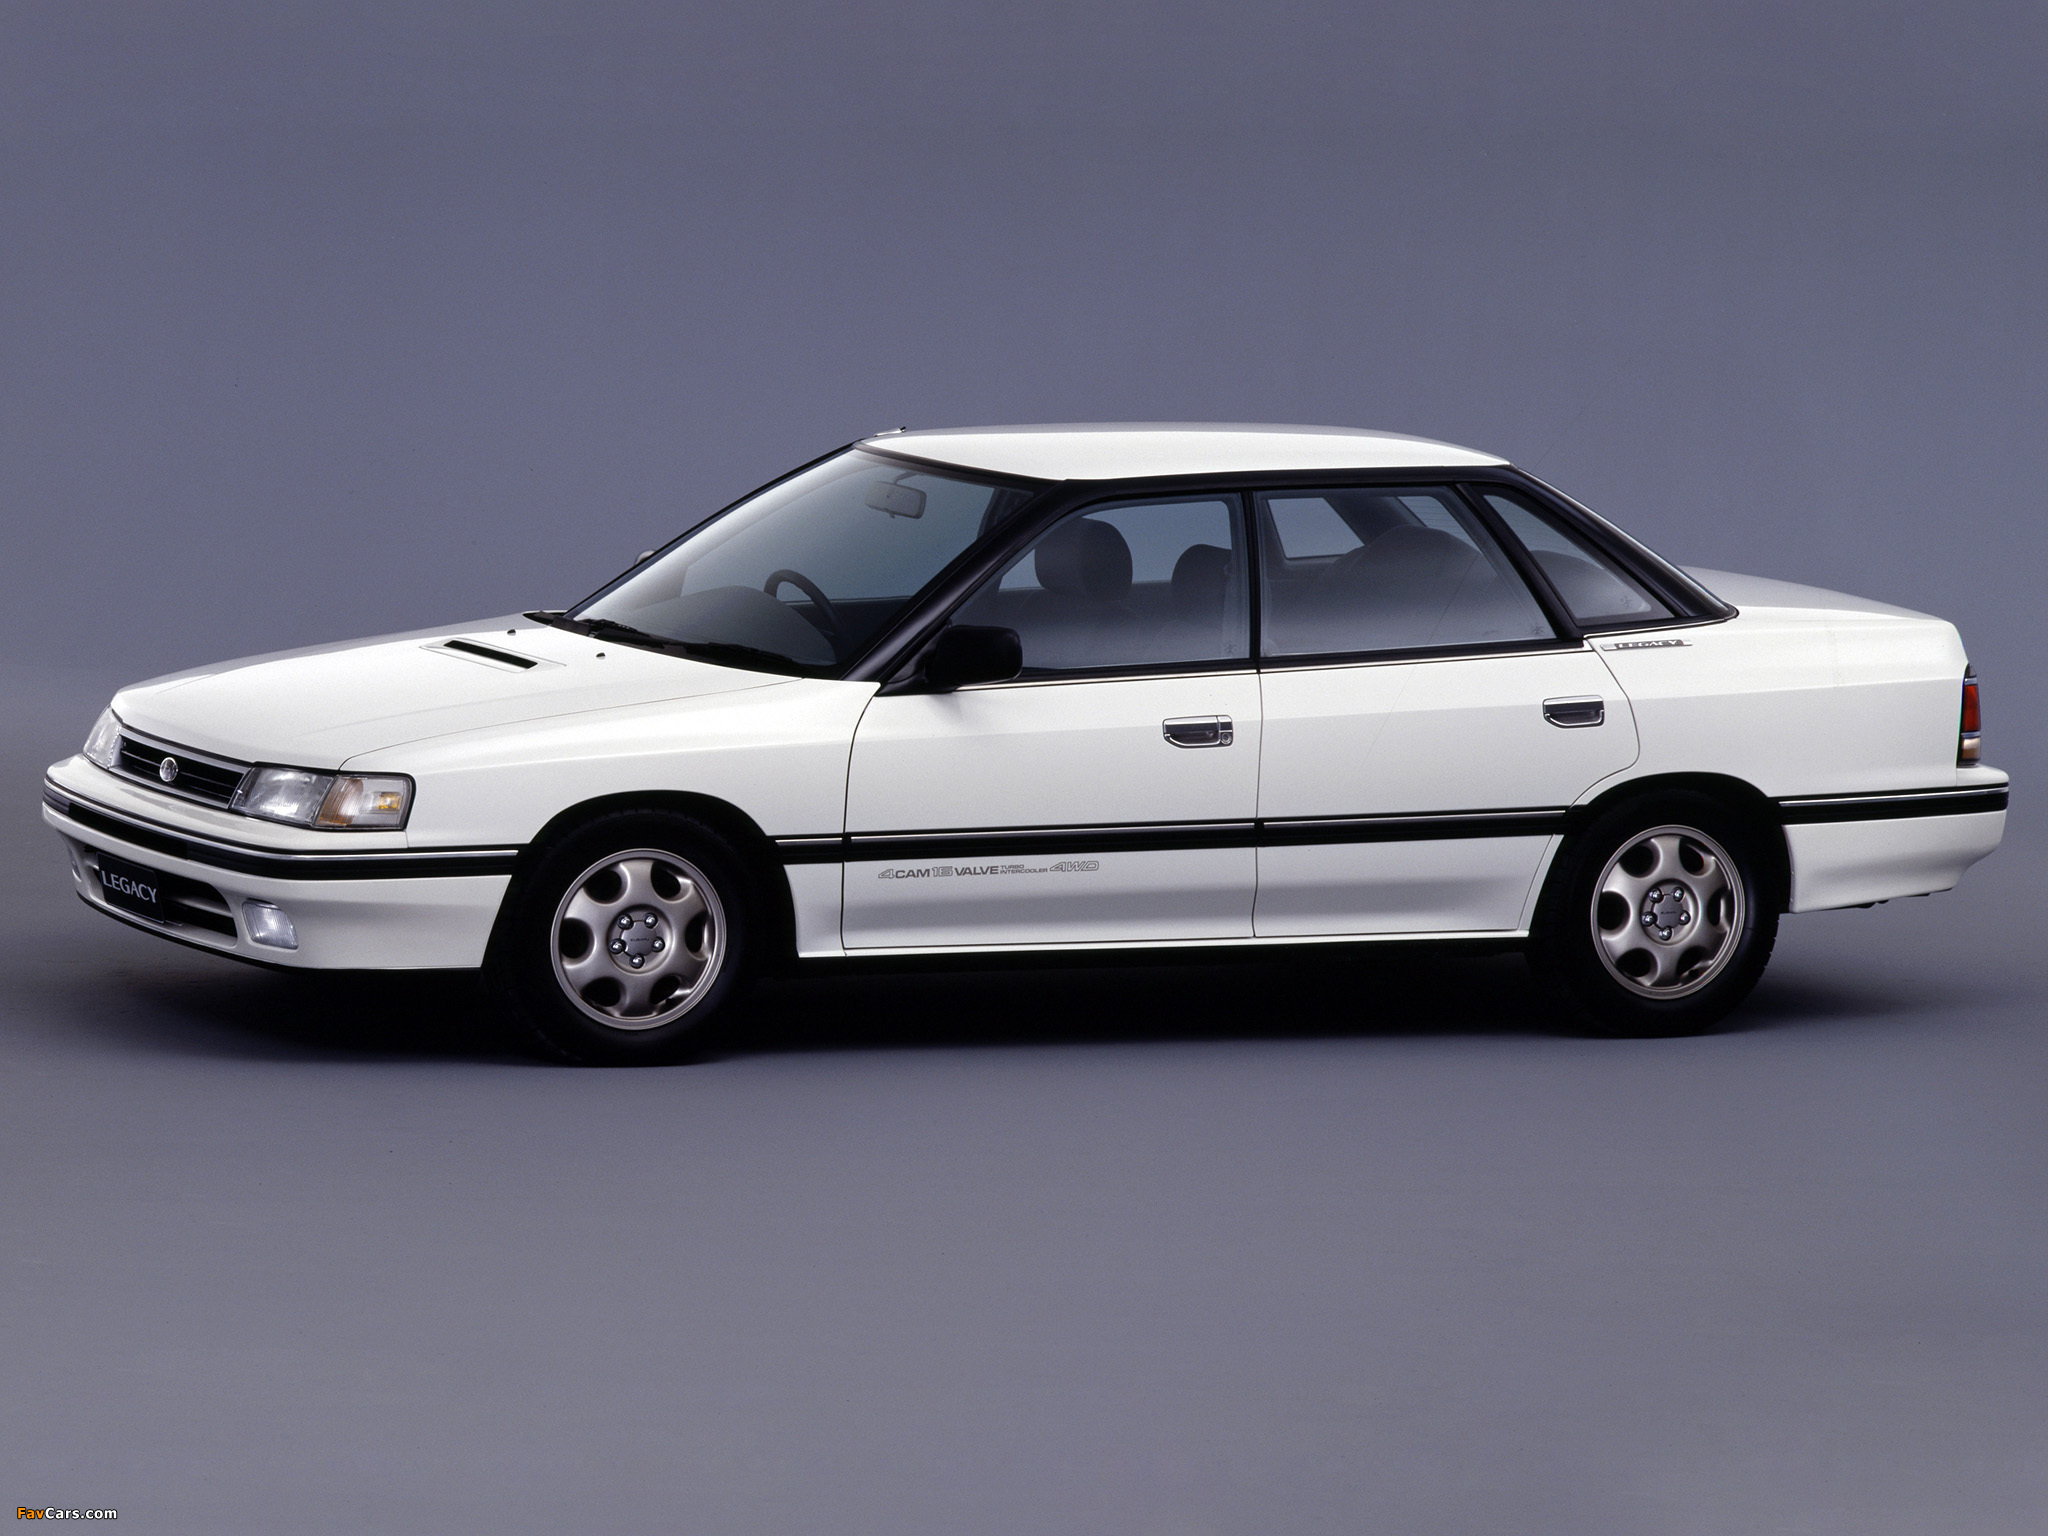 1989 Subaru Legacy